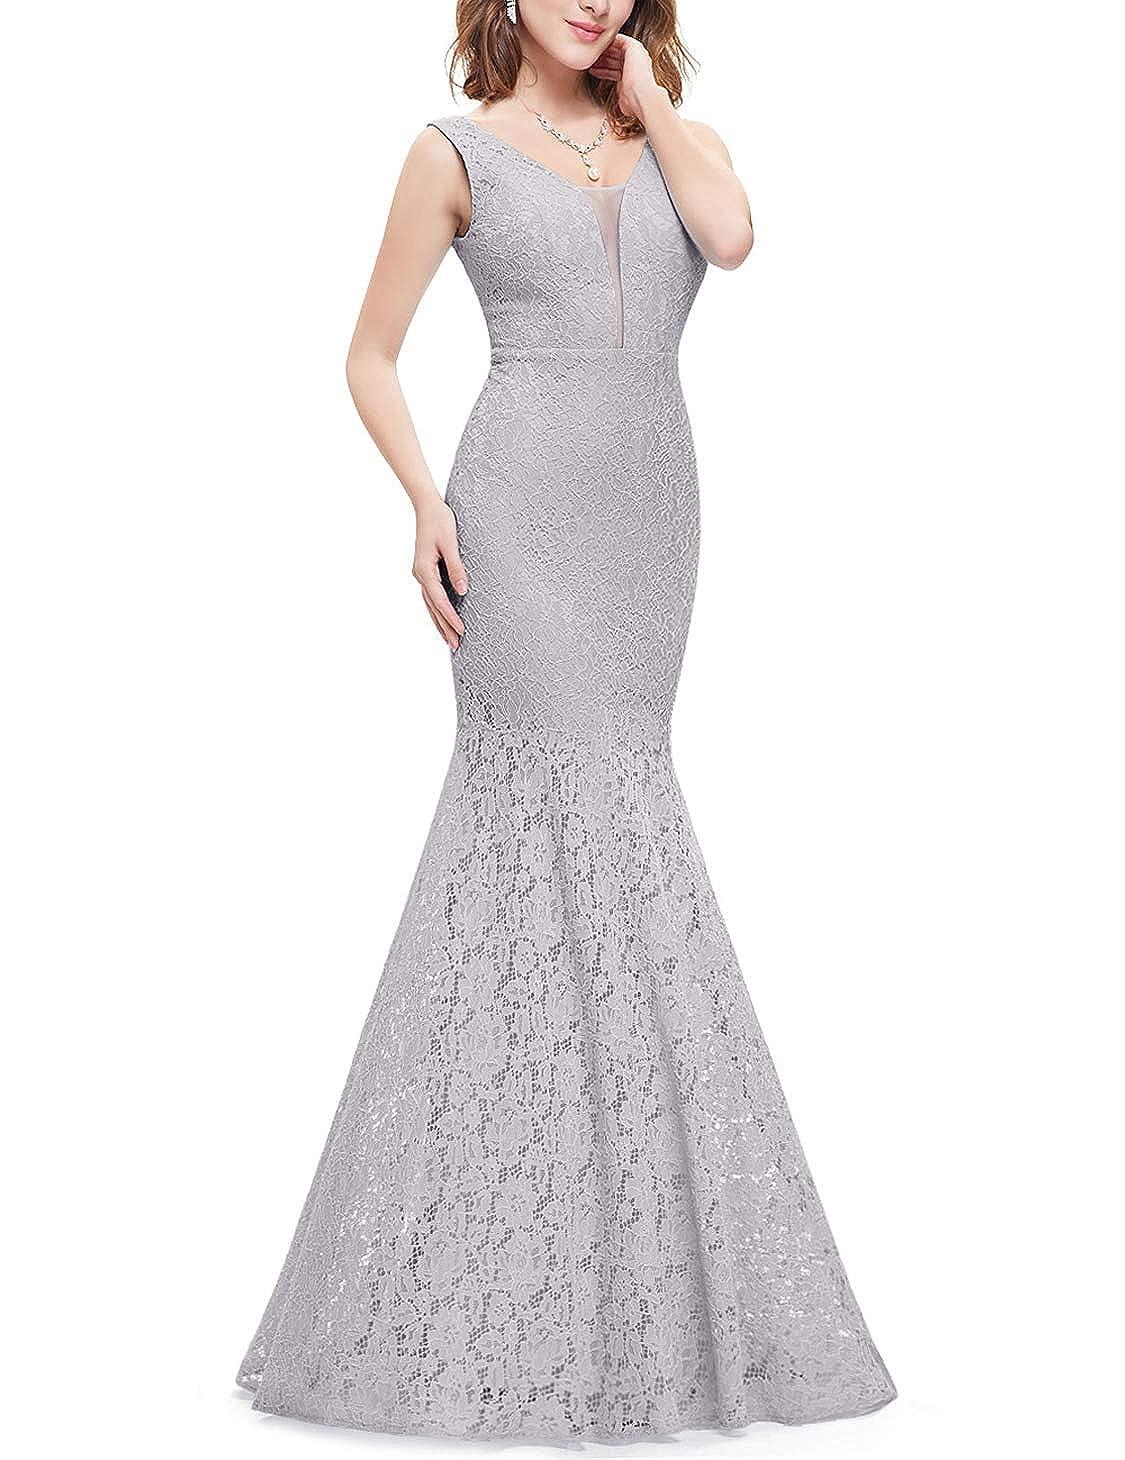 da069e5c4cd Ever-Pretty Womens Romantic Sexy Lace Floor Length V-Neck Evening Prom Dress  08838 at Amazon Women s Clothing store